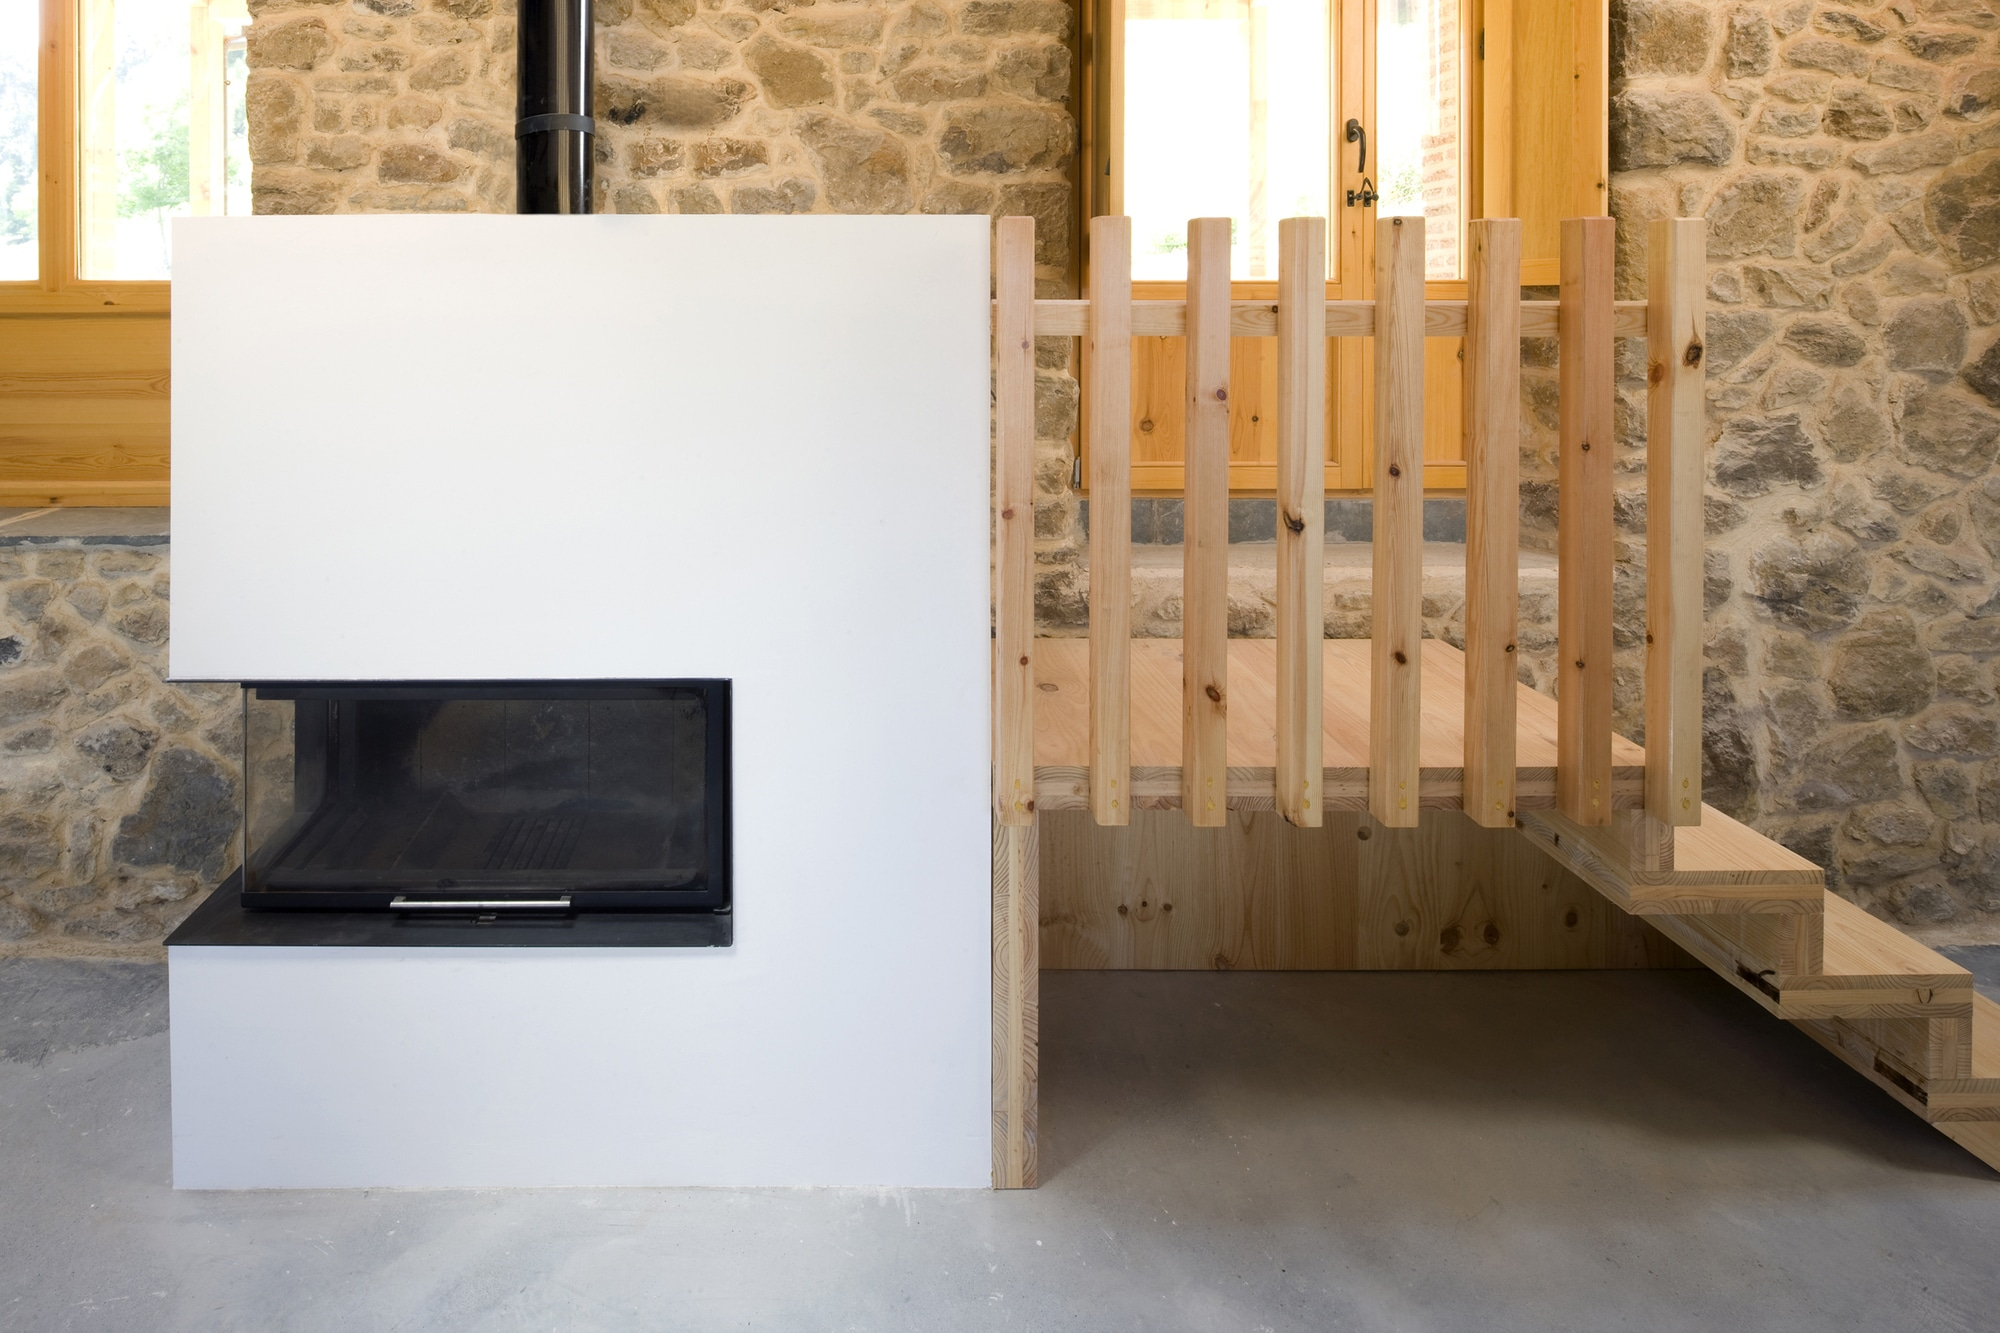 Dise o de casa r stica de piedra planos construye hogar - Casas rurales madera ...